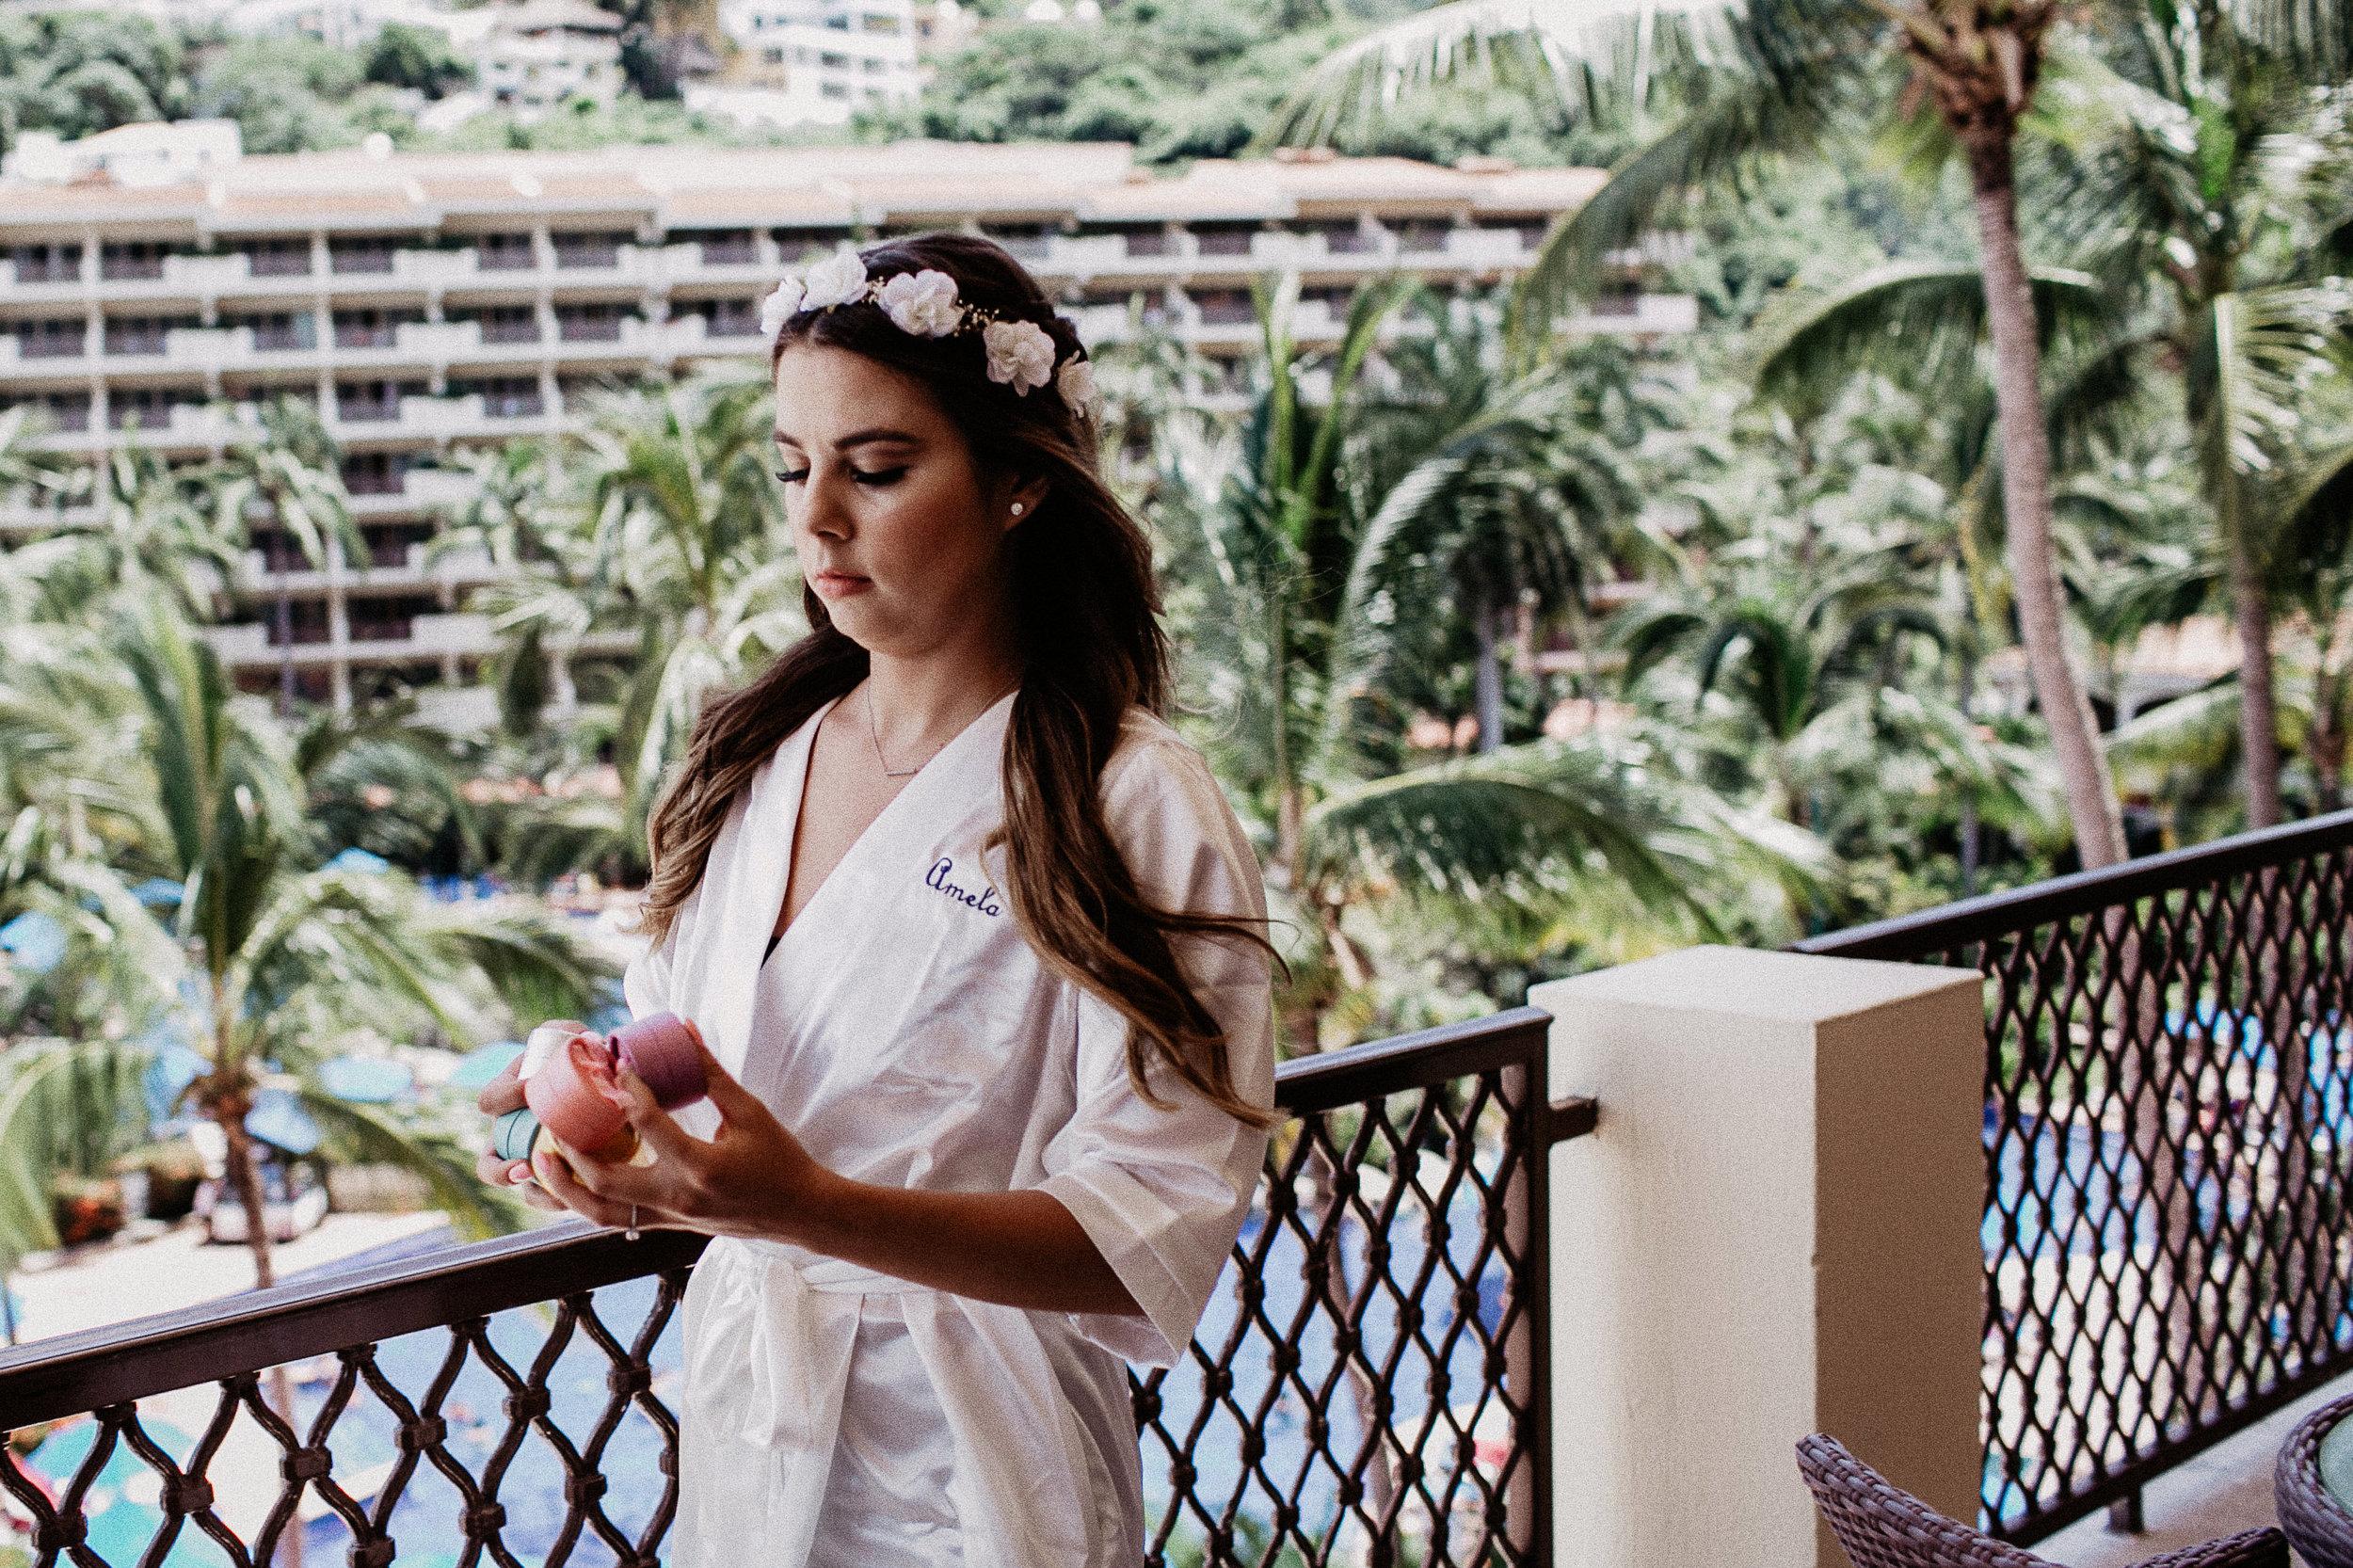 alfonso_flores_destination_wedding_photography_puerto_vallarta_hotel_barcelo_vallarta_cuttler_amela-143.JPG